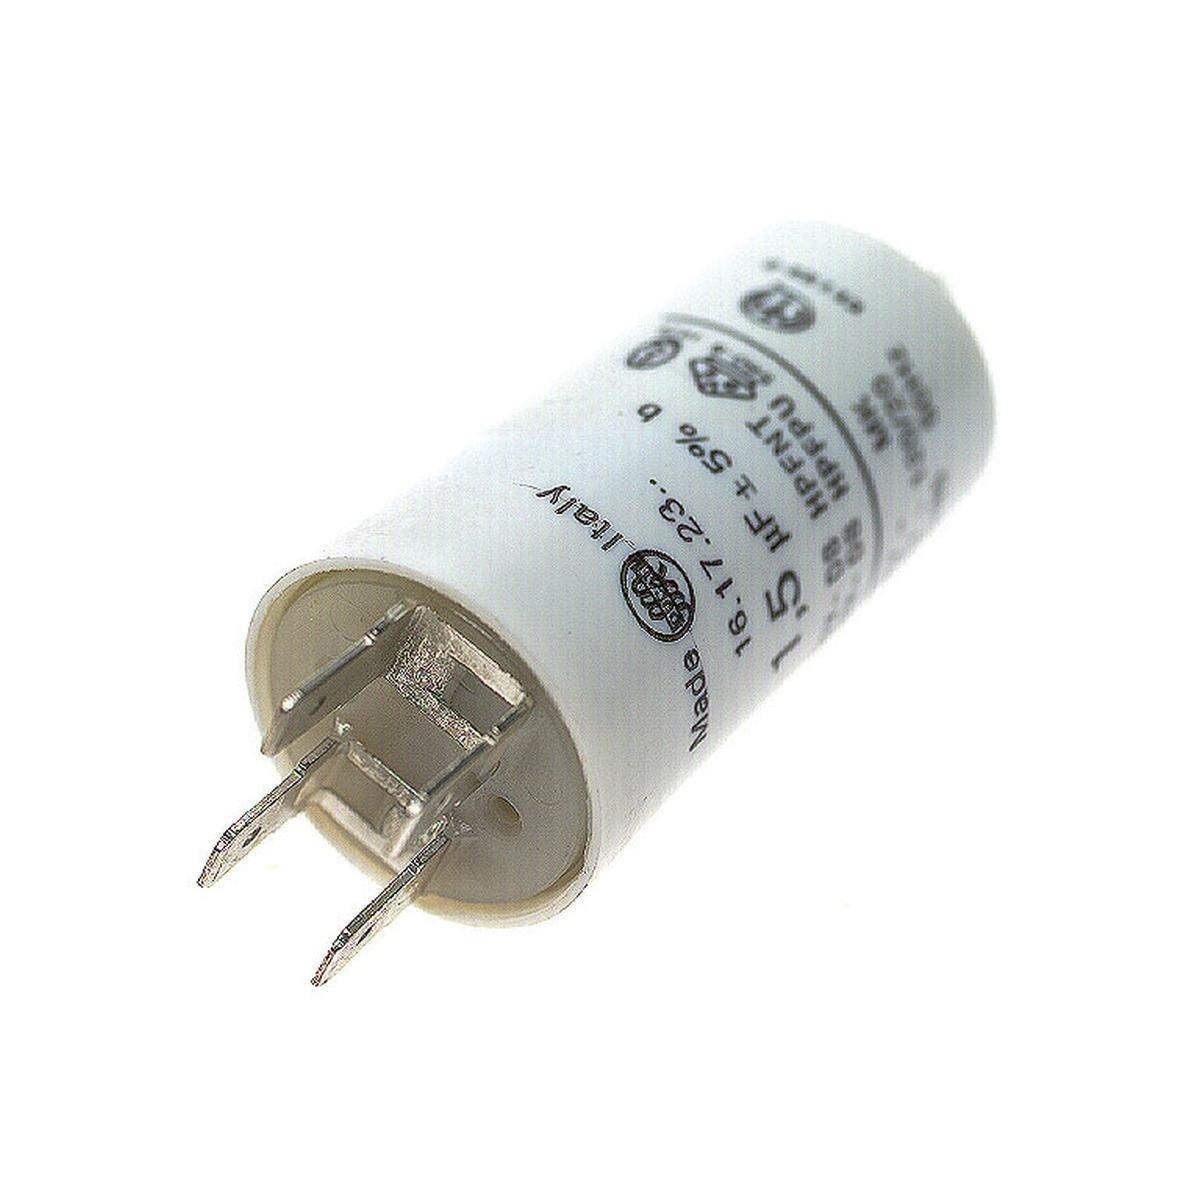 Kondensator 20,0 µF 450V